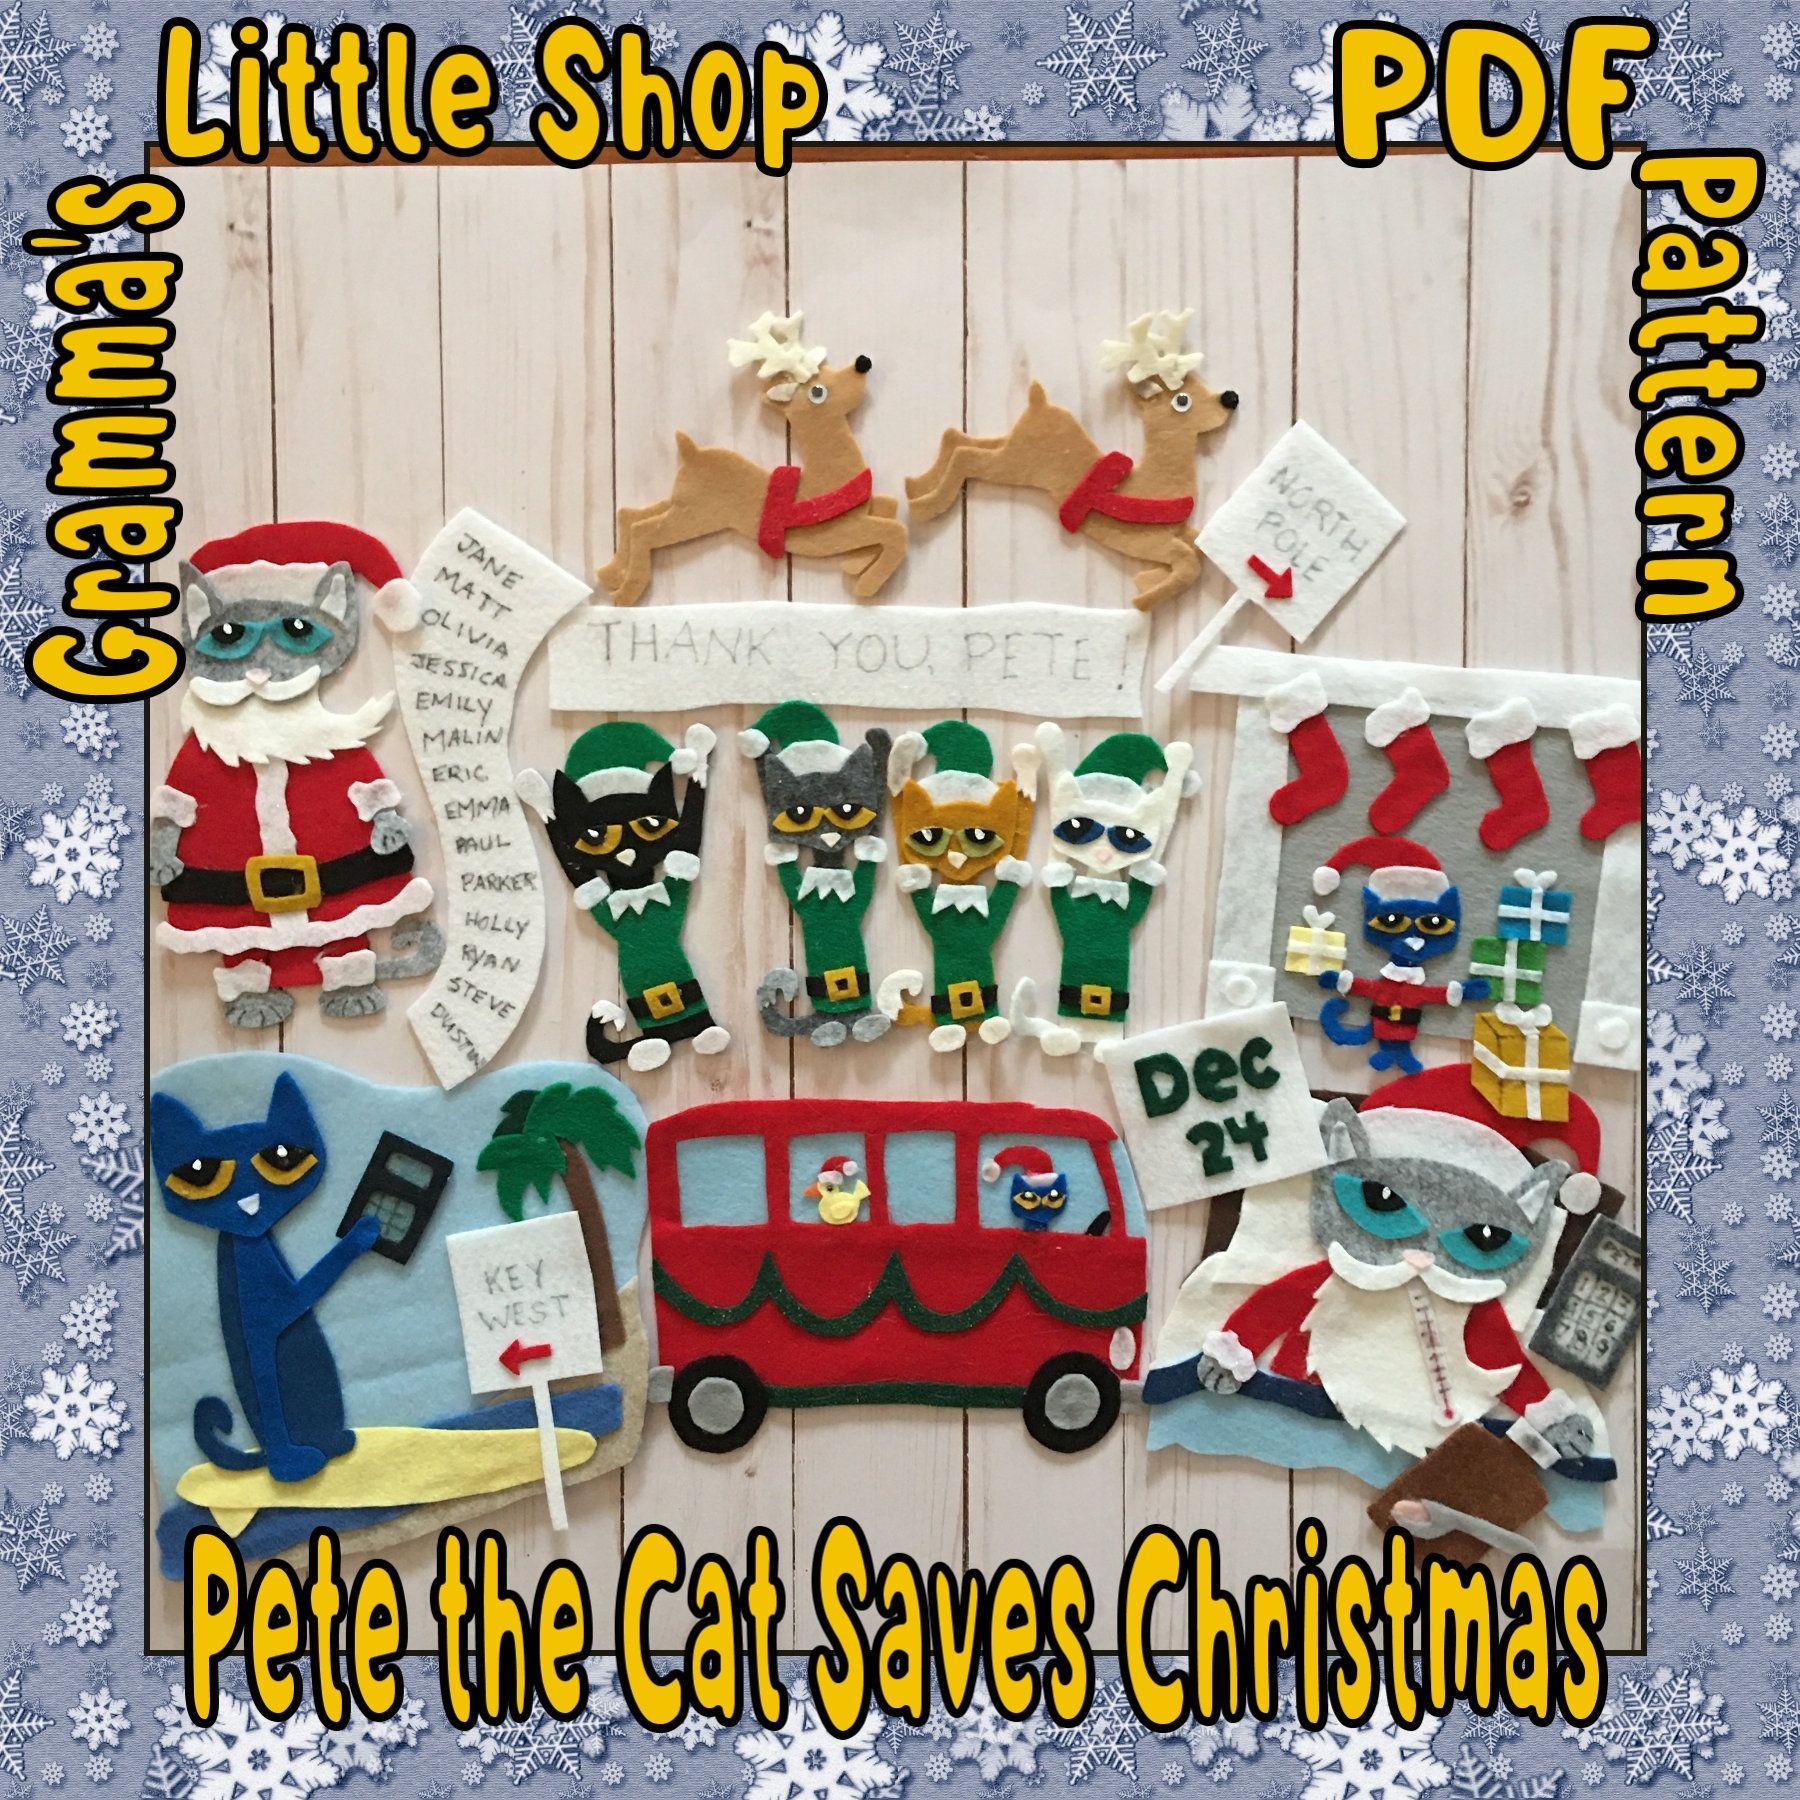 Pete the Cat Saves Christmas felt story pattern PDF